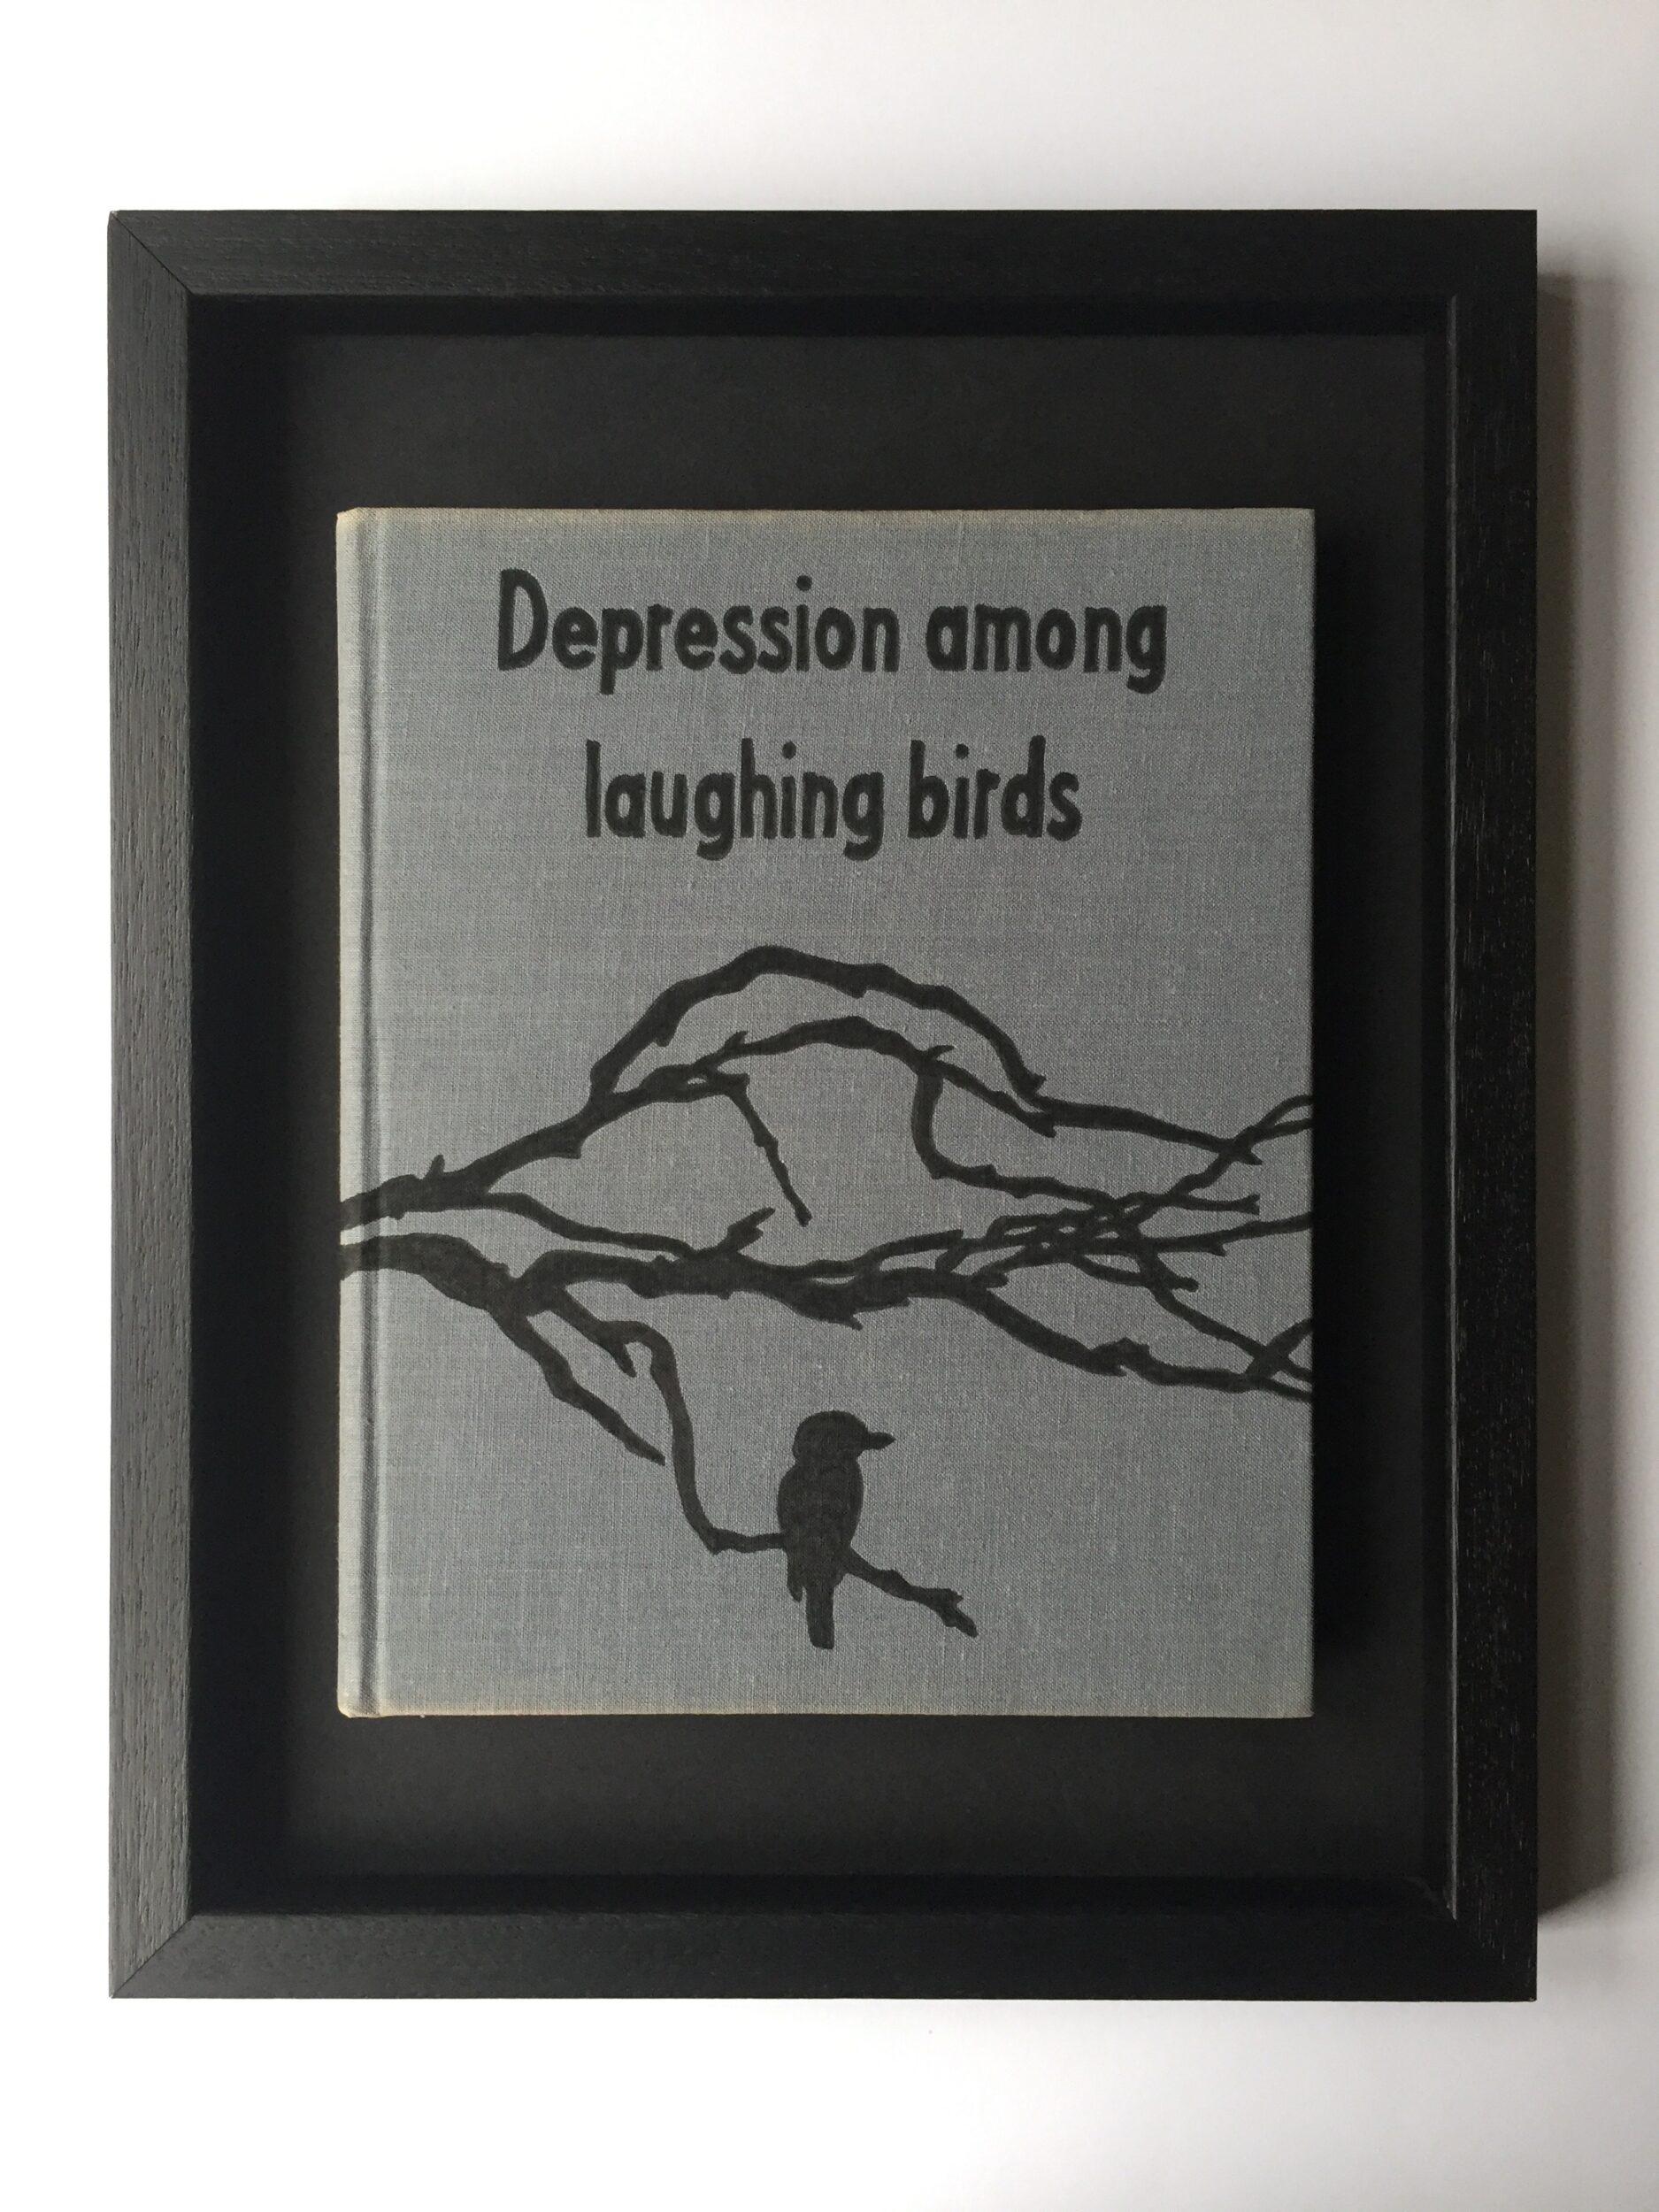 Laughing Birds